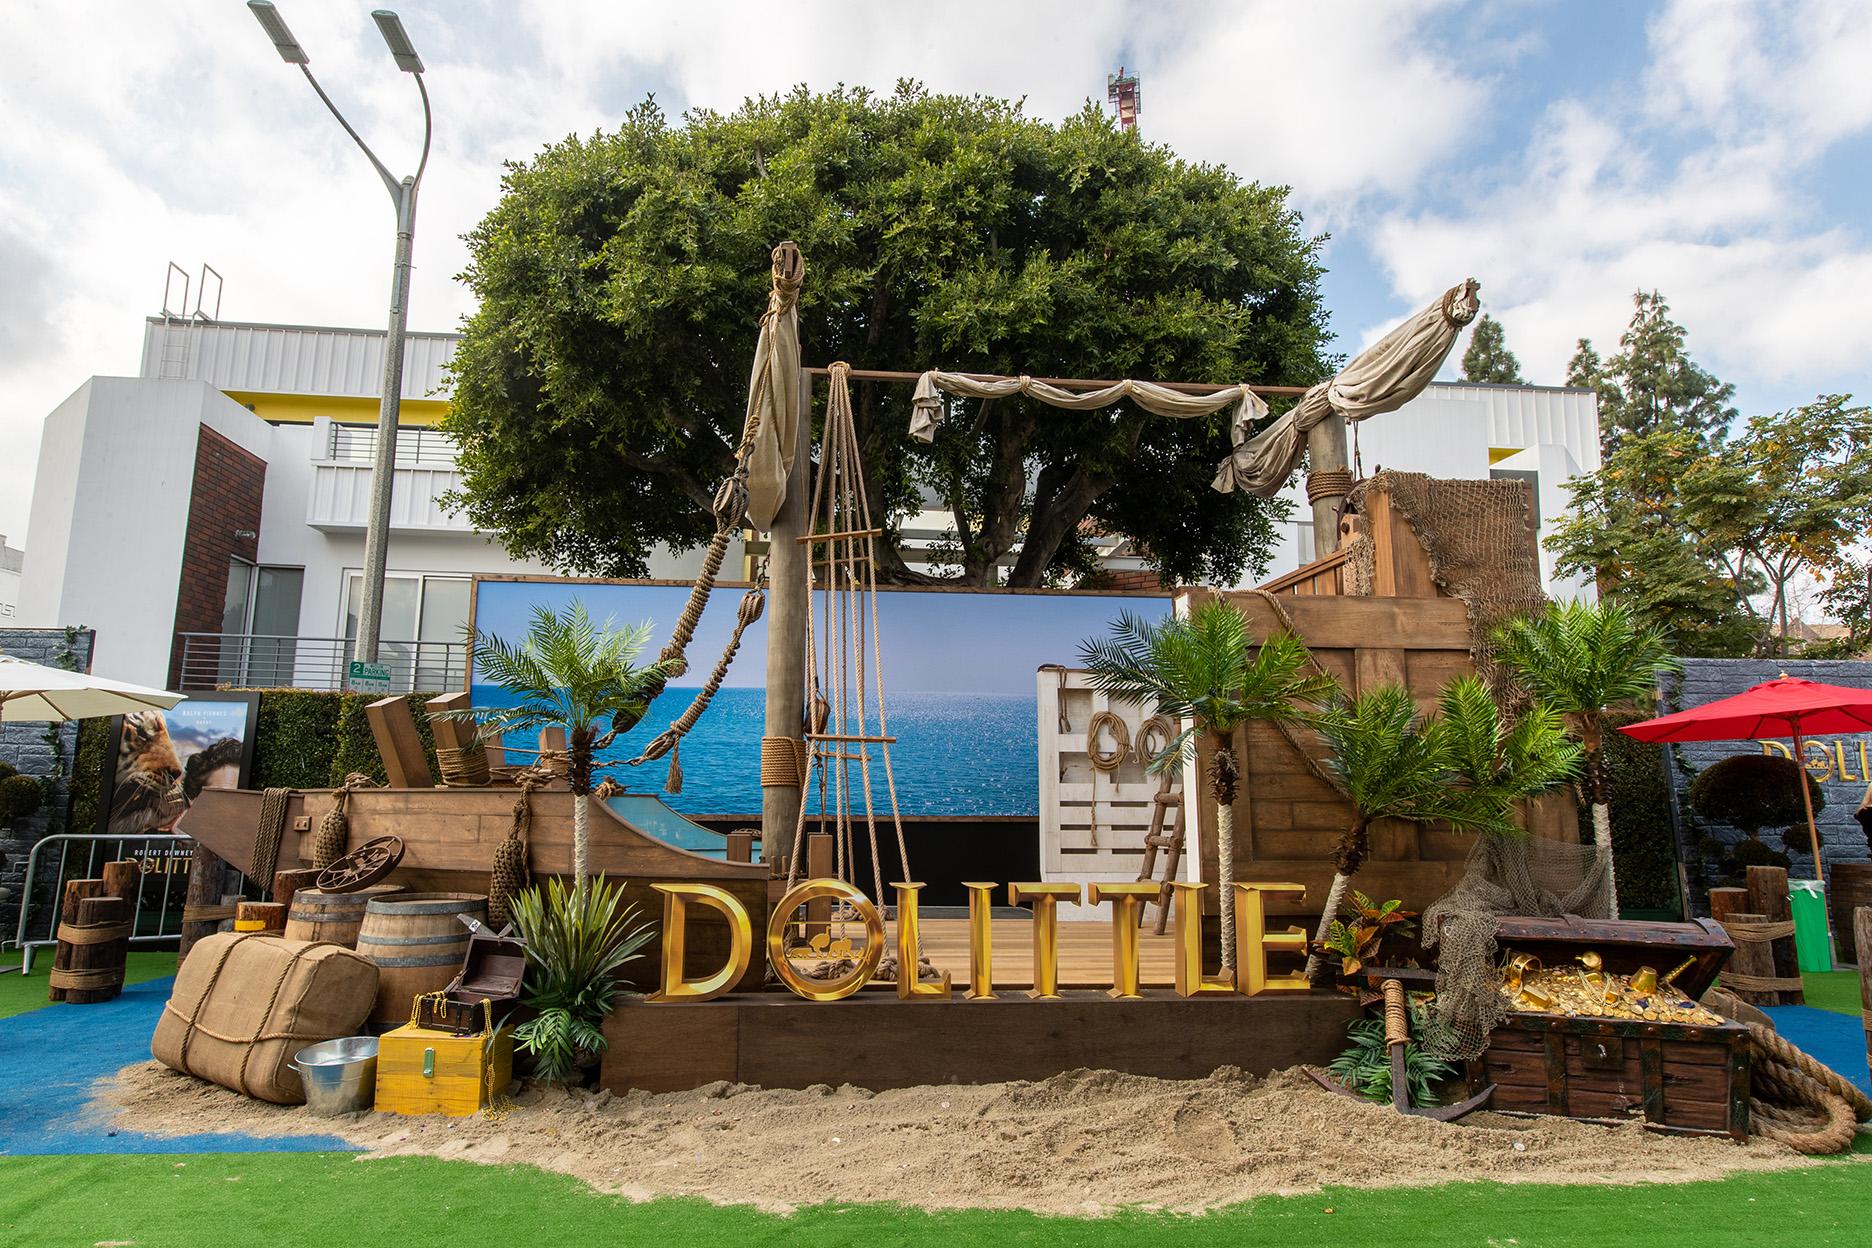 Dolittle Movie Premiere Los Angeles JG2 Collective